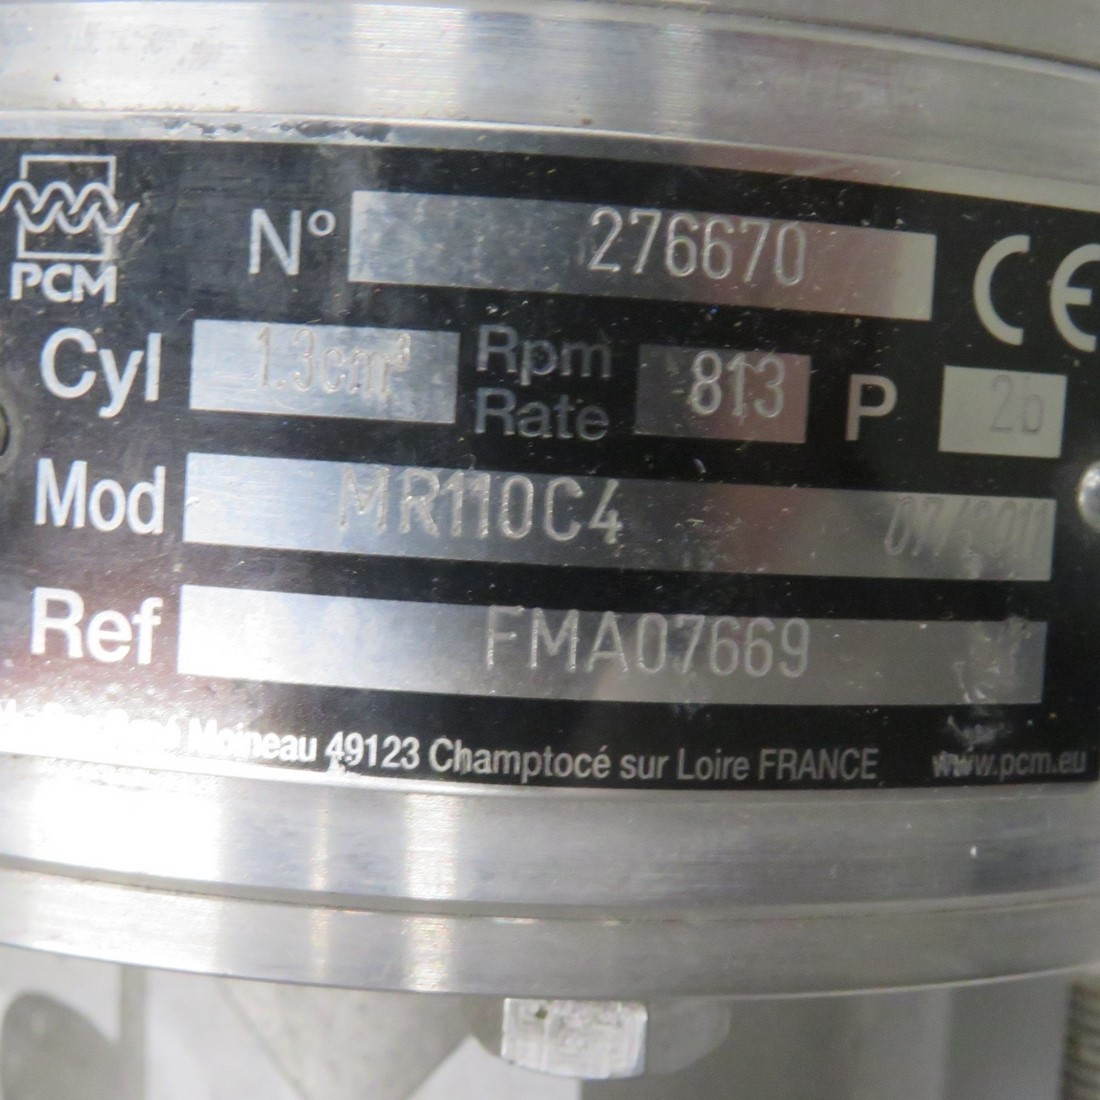 R10DA878 PCM pump MR110C4 type